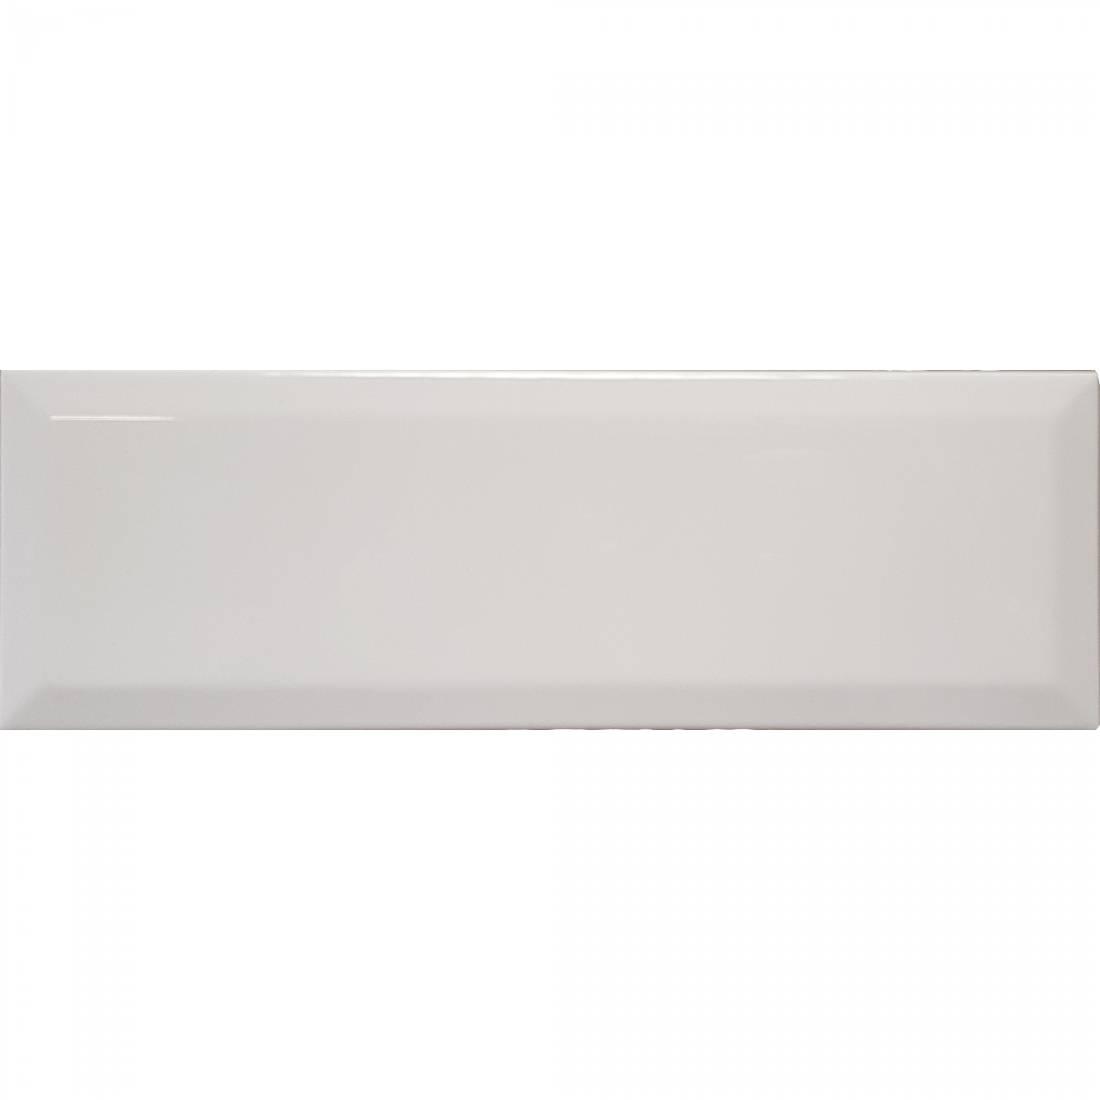 Biselado 10x30 White Gloss 1